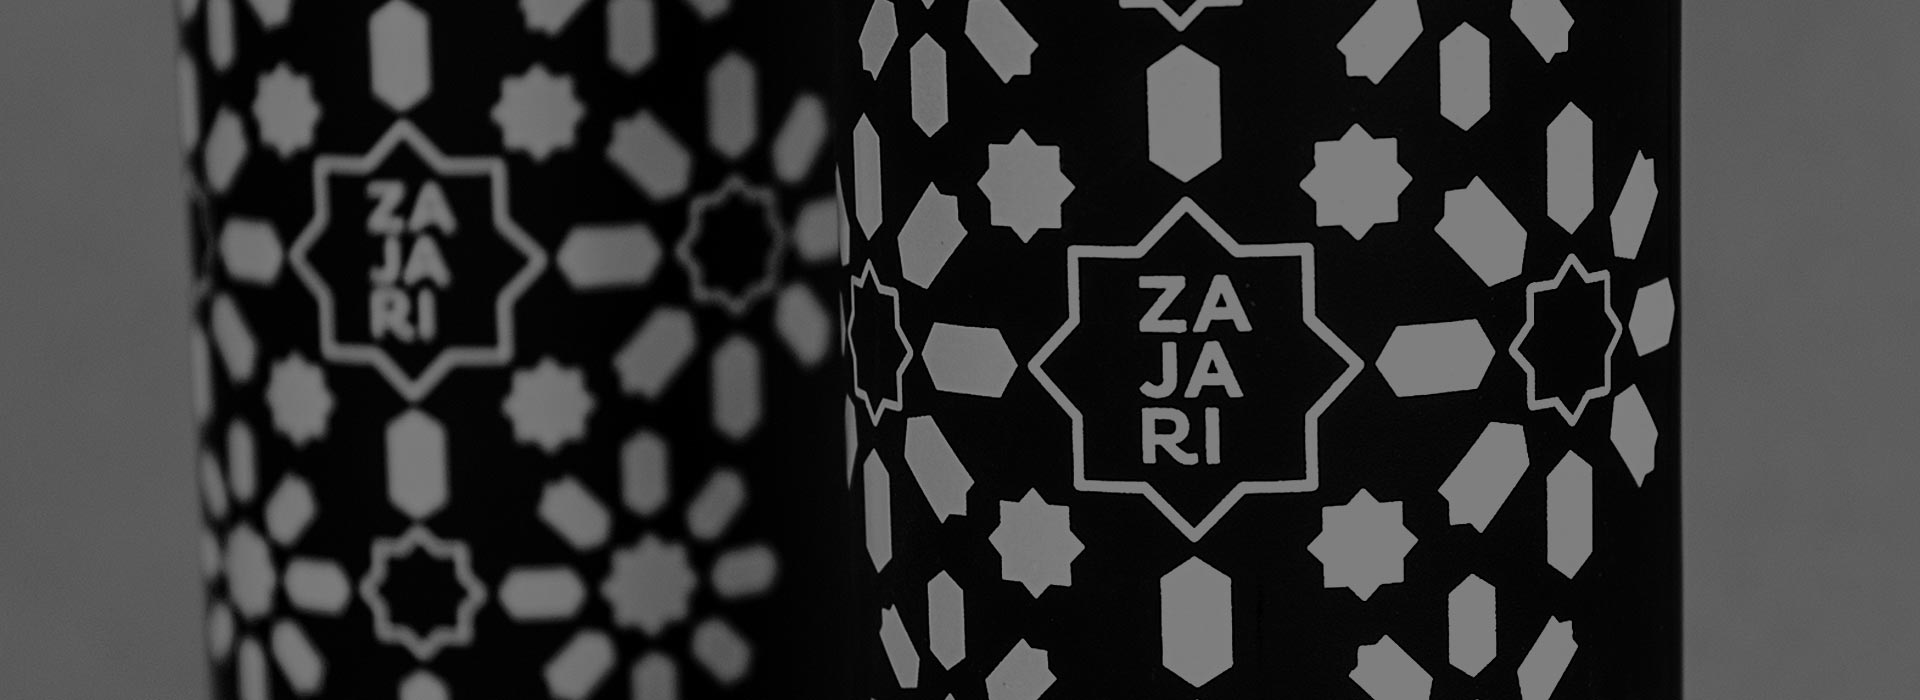 Diseño Identidad corporativa Aceite de oliva virgen extra Zajari